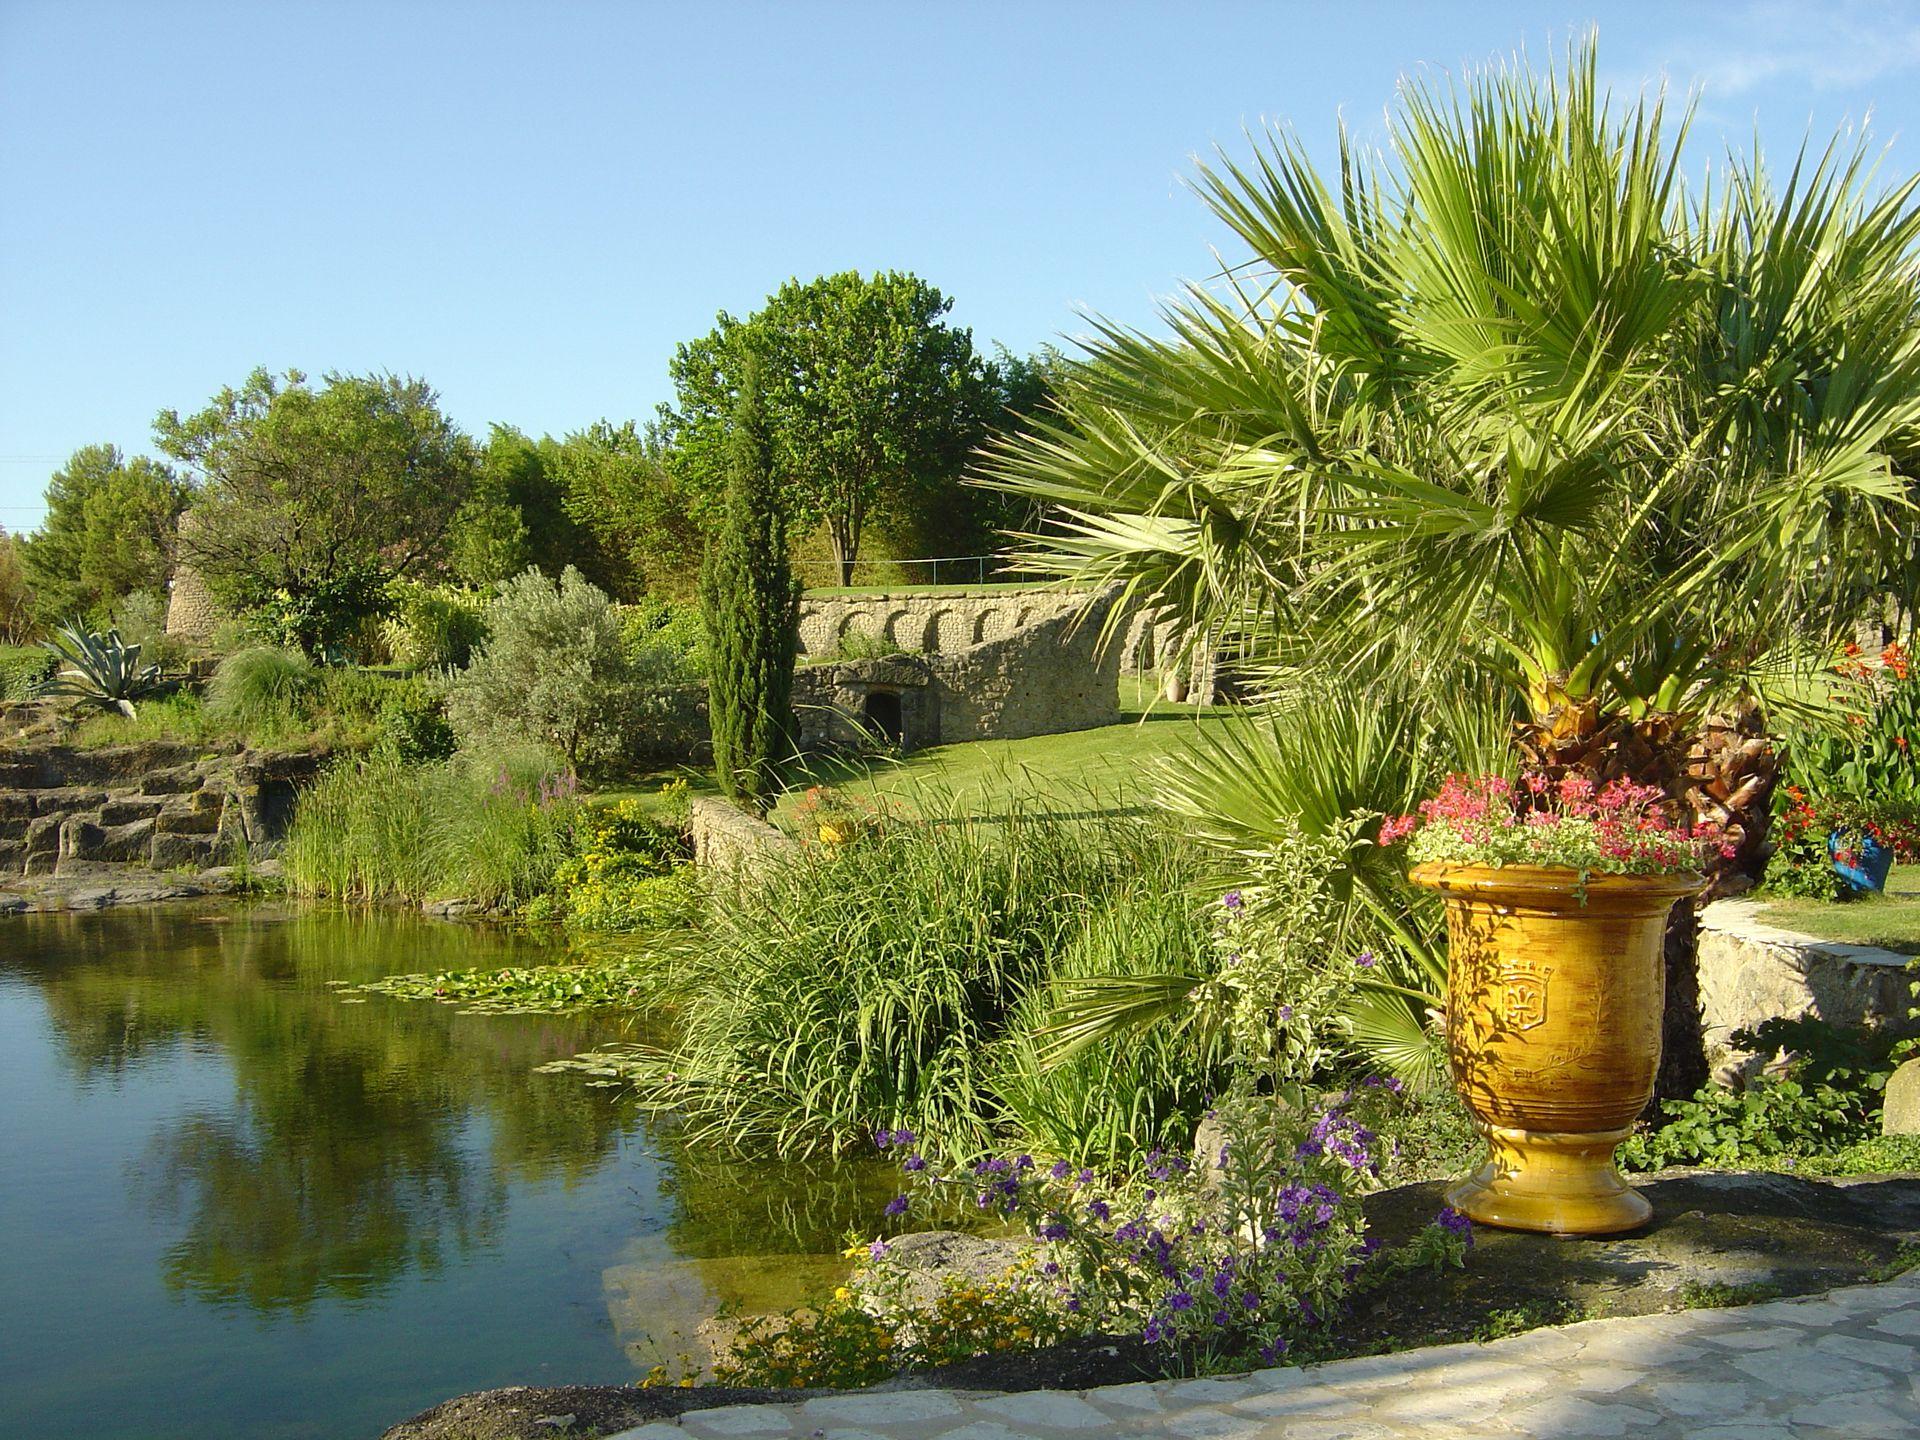 Servian - Jardin de Saint Adrien